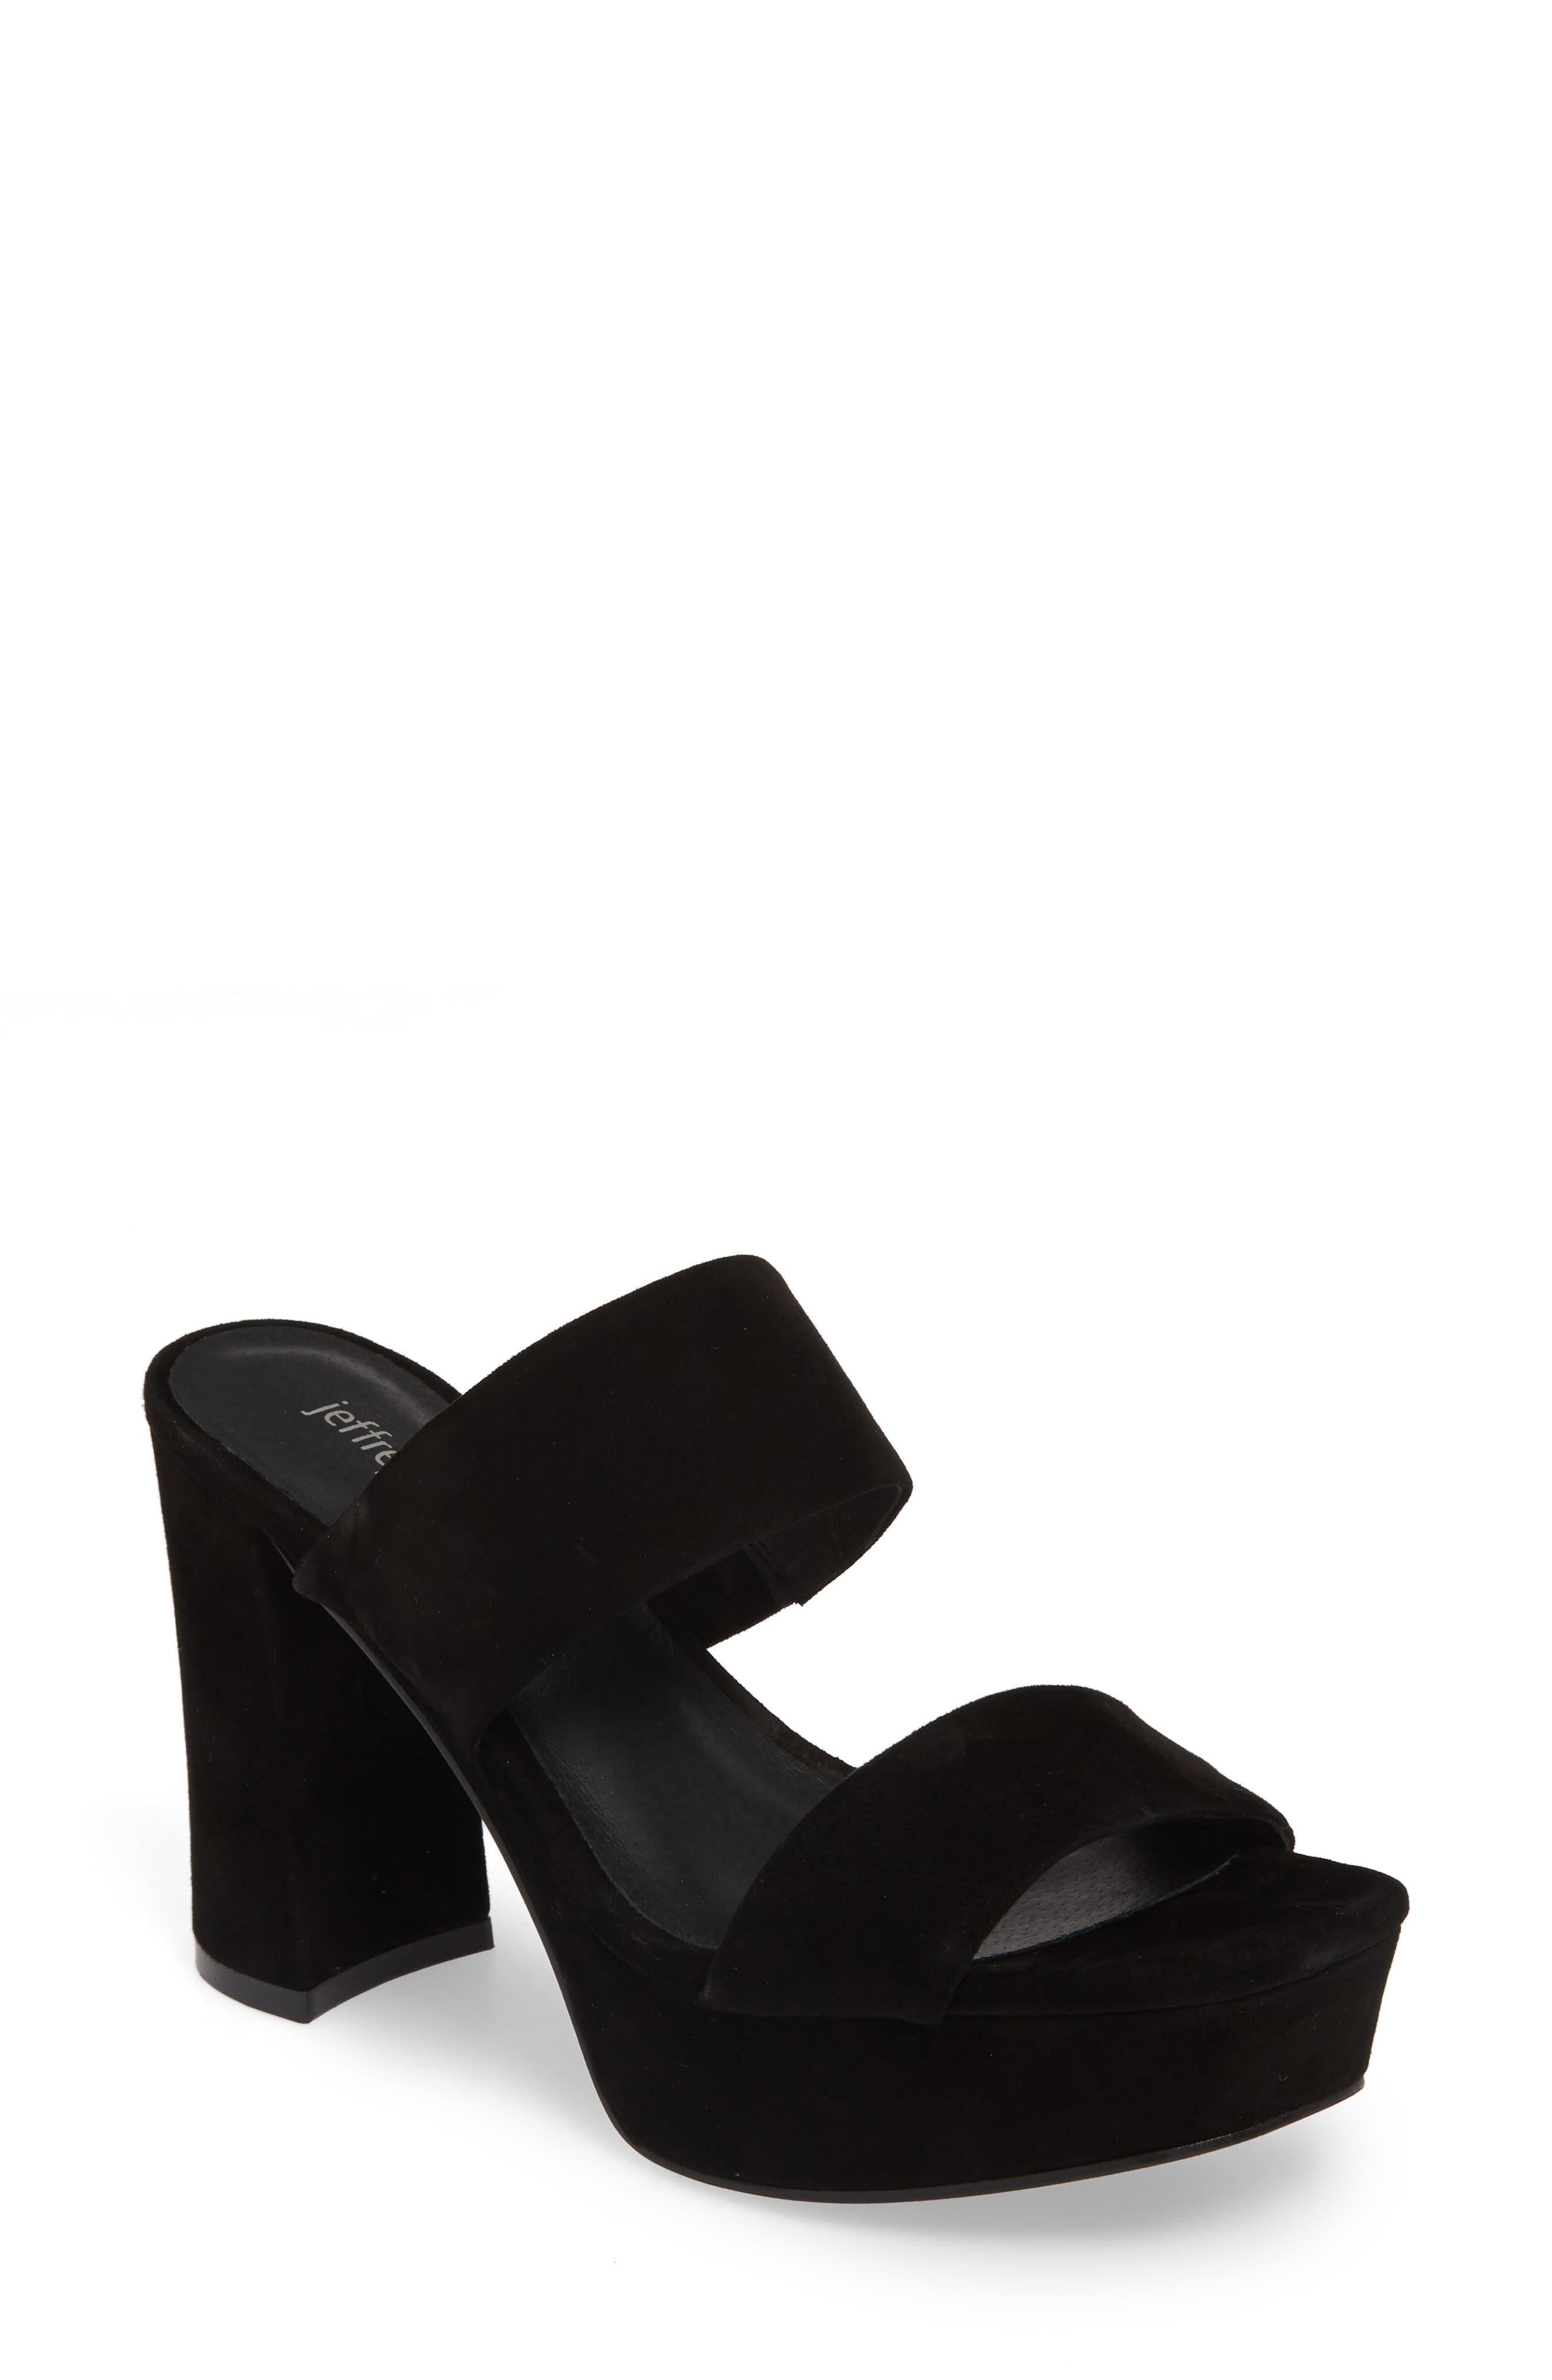 5d691d4f51e Jeffrey Campbell Adriana-2 Platform Slide Sandal